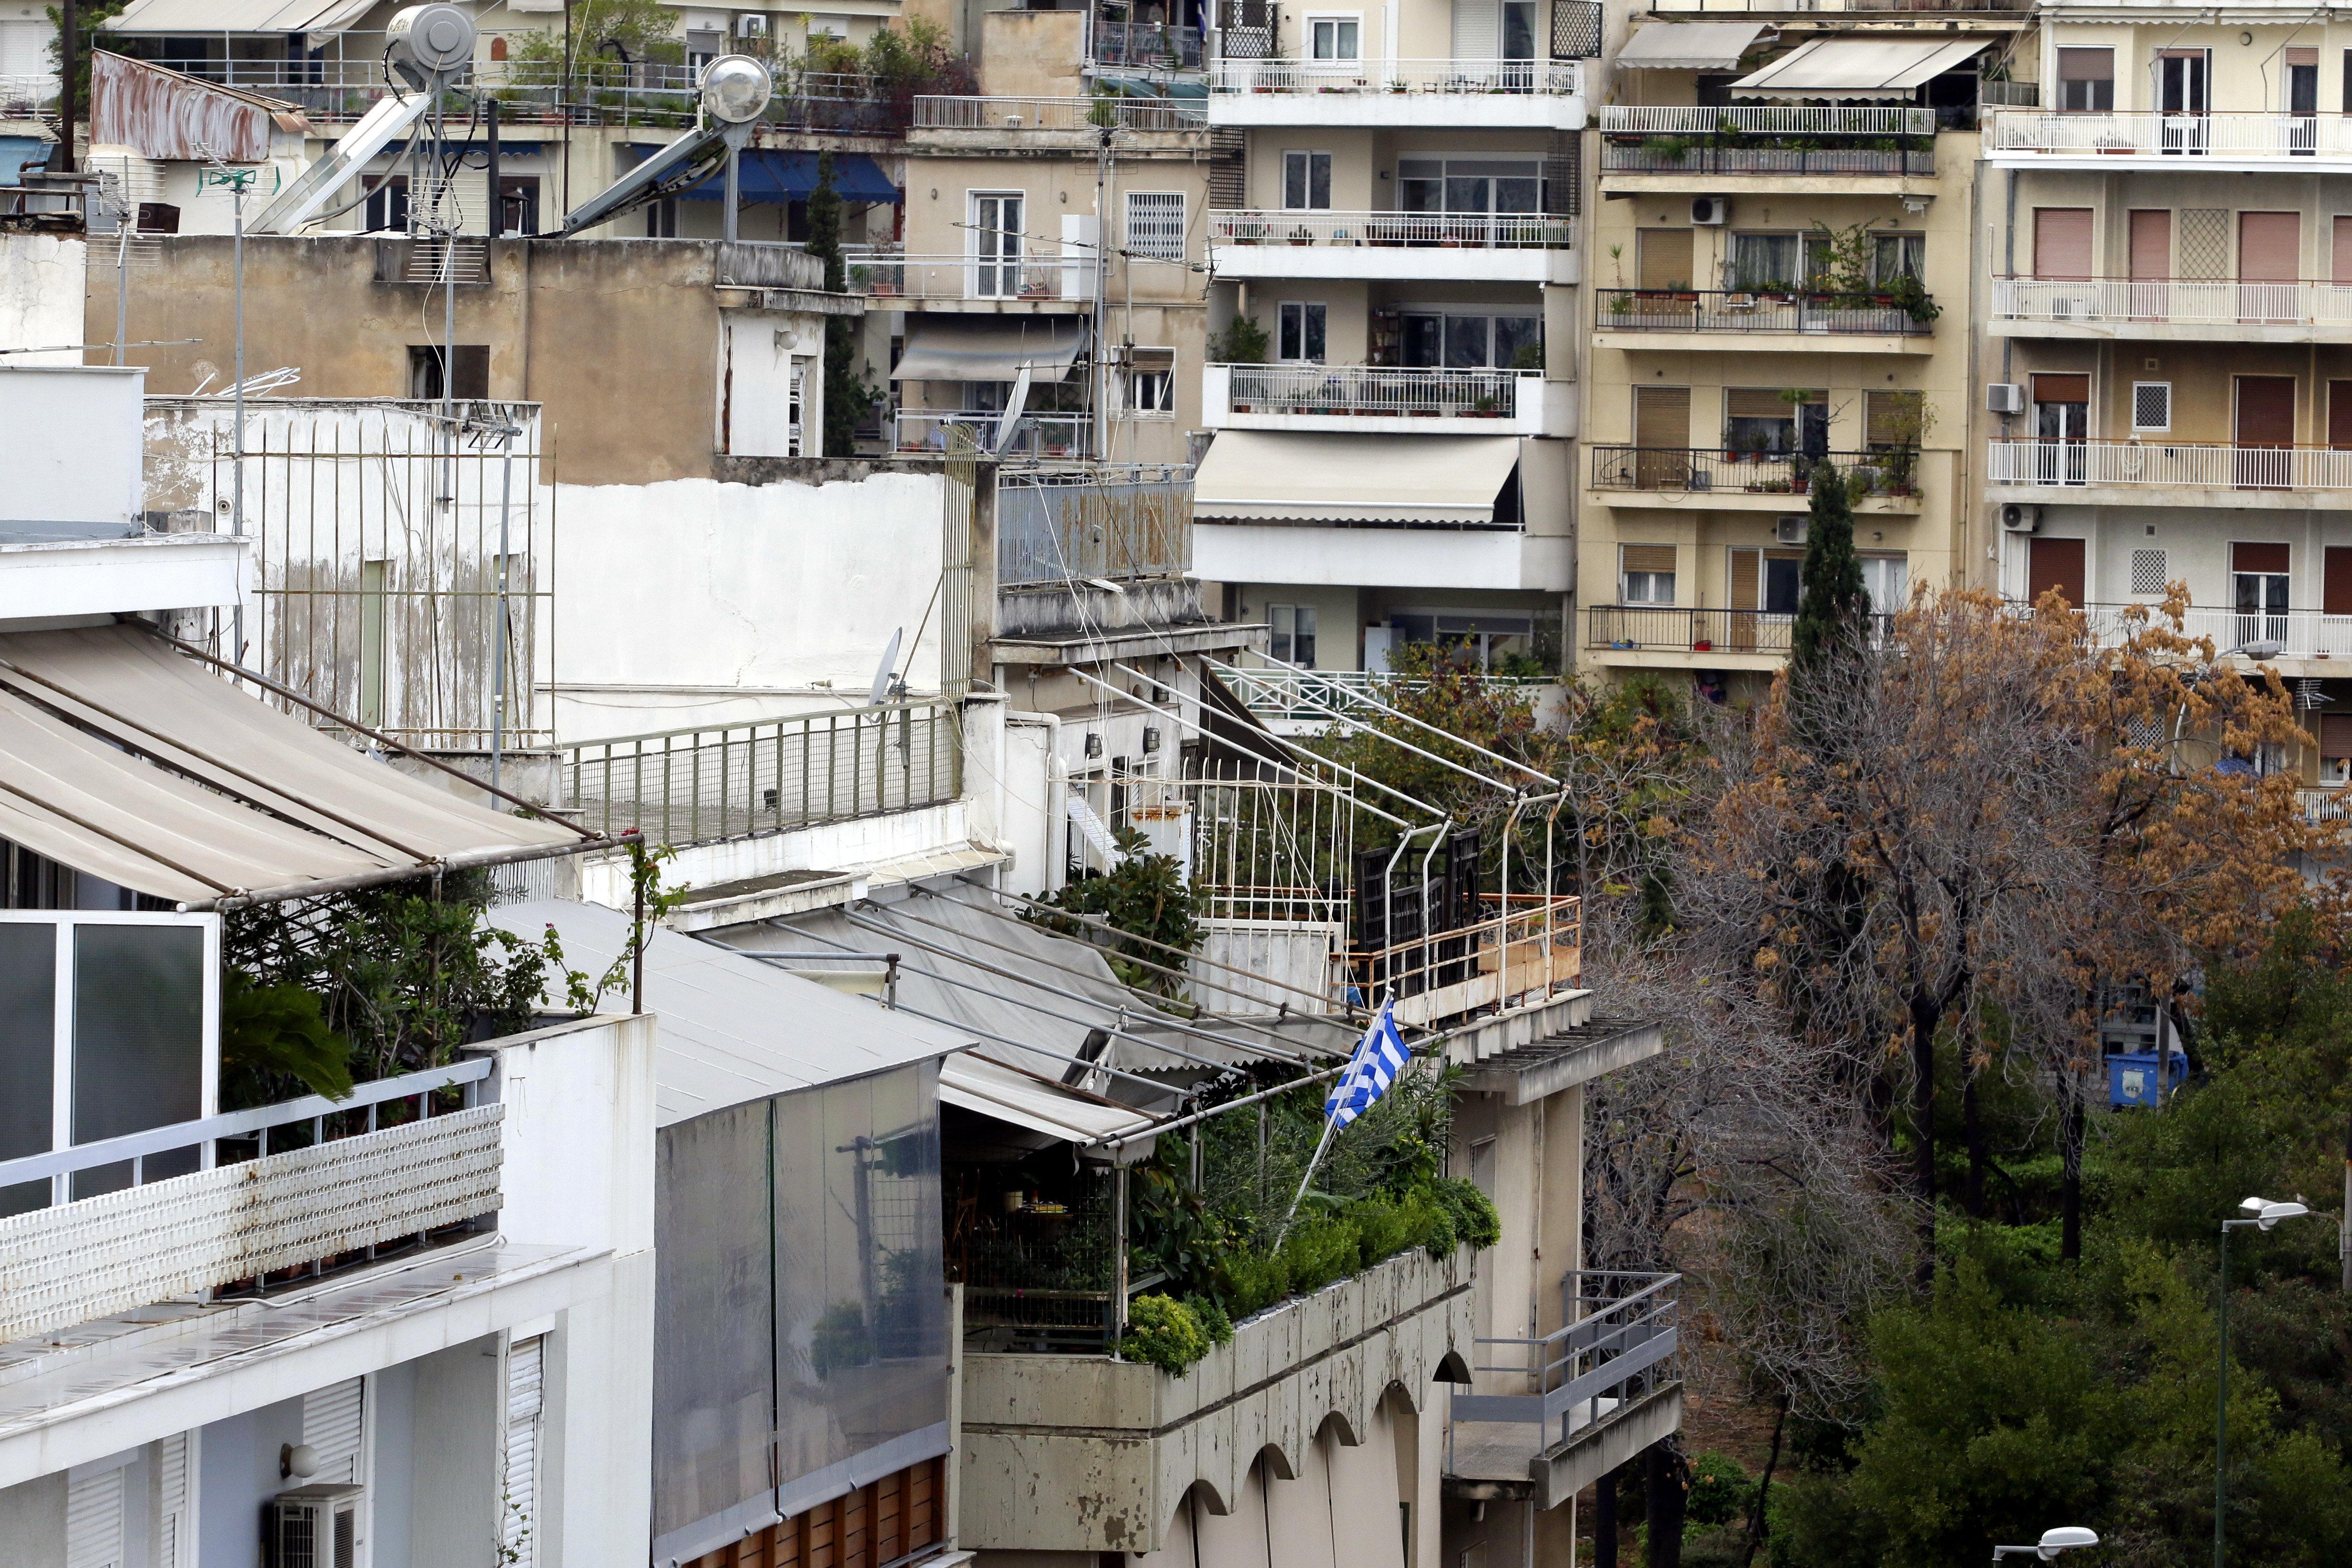 Eurogroup: Μπαράζ πλειστηριασμών μέχρι το 2021 απαιτούν οι